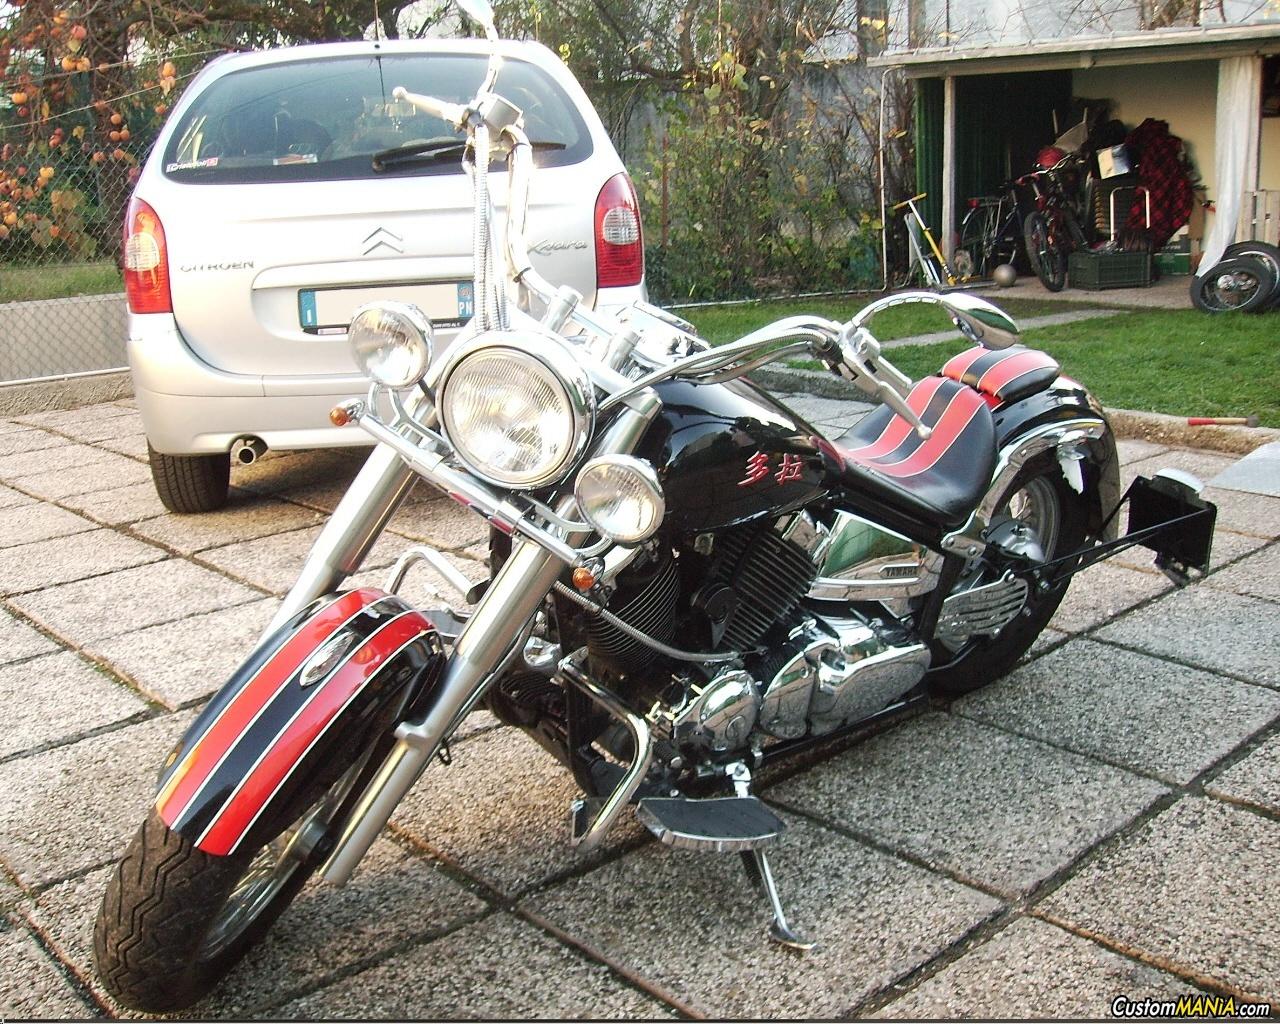 Schema Elettrico Yamaha Dragstar 650 : Dragstar xvs classic custommania